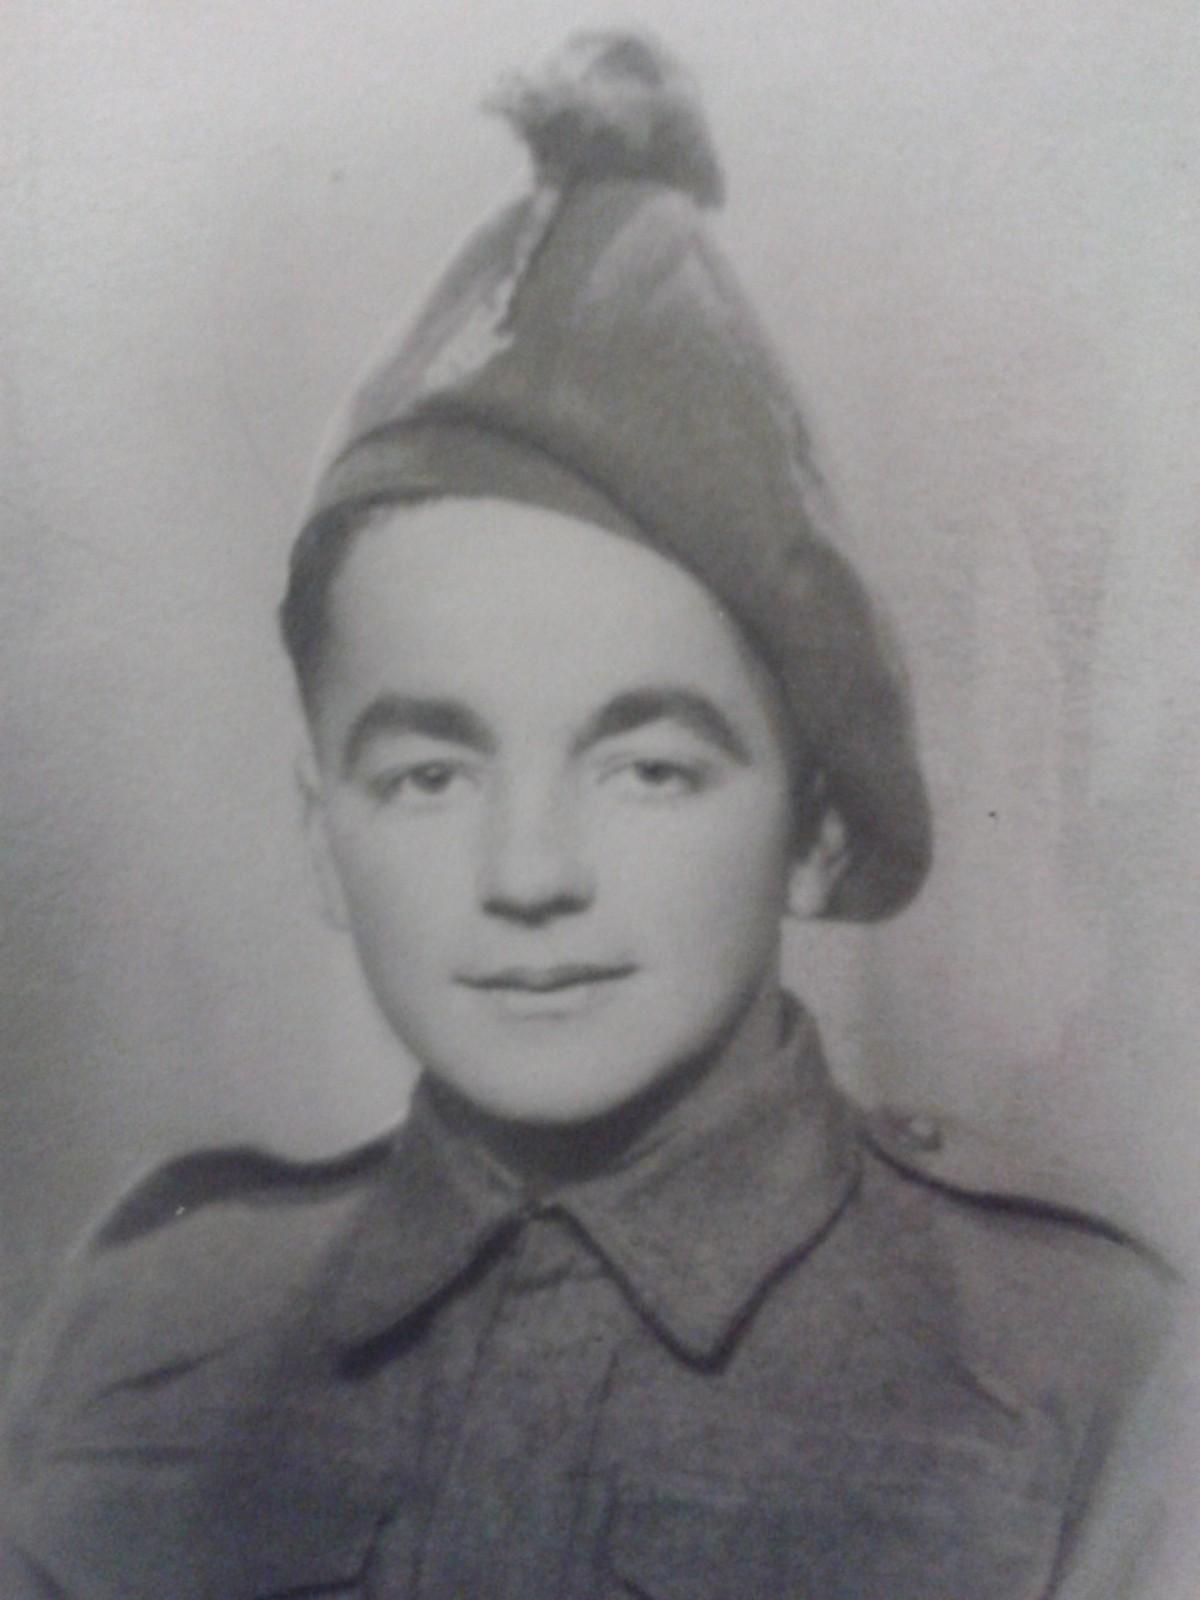 John Young Charlton